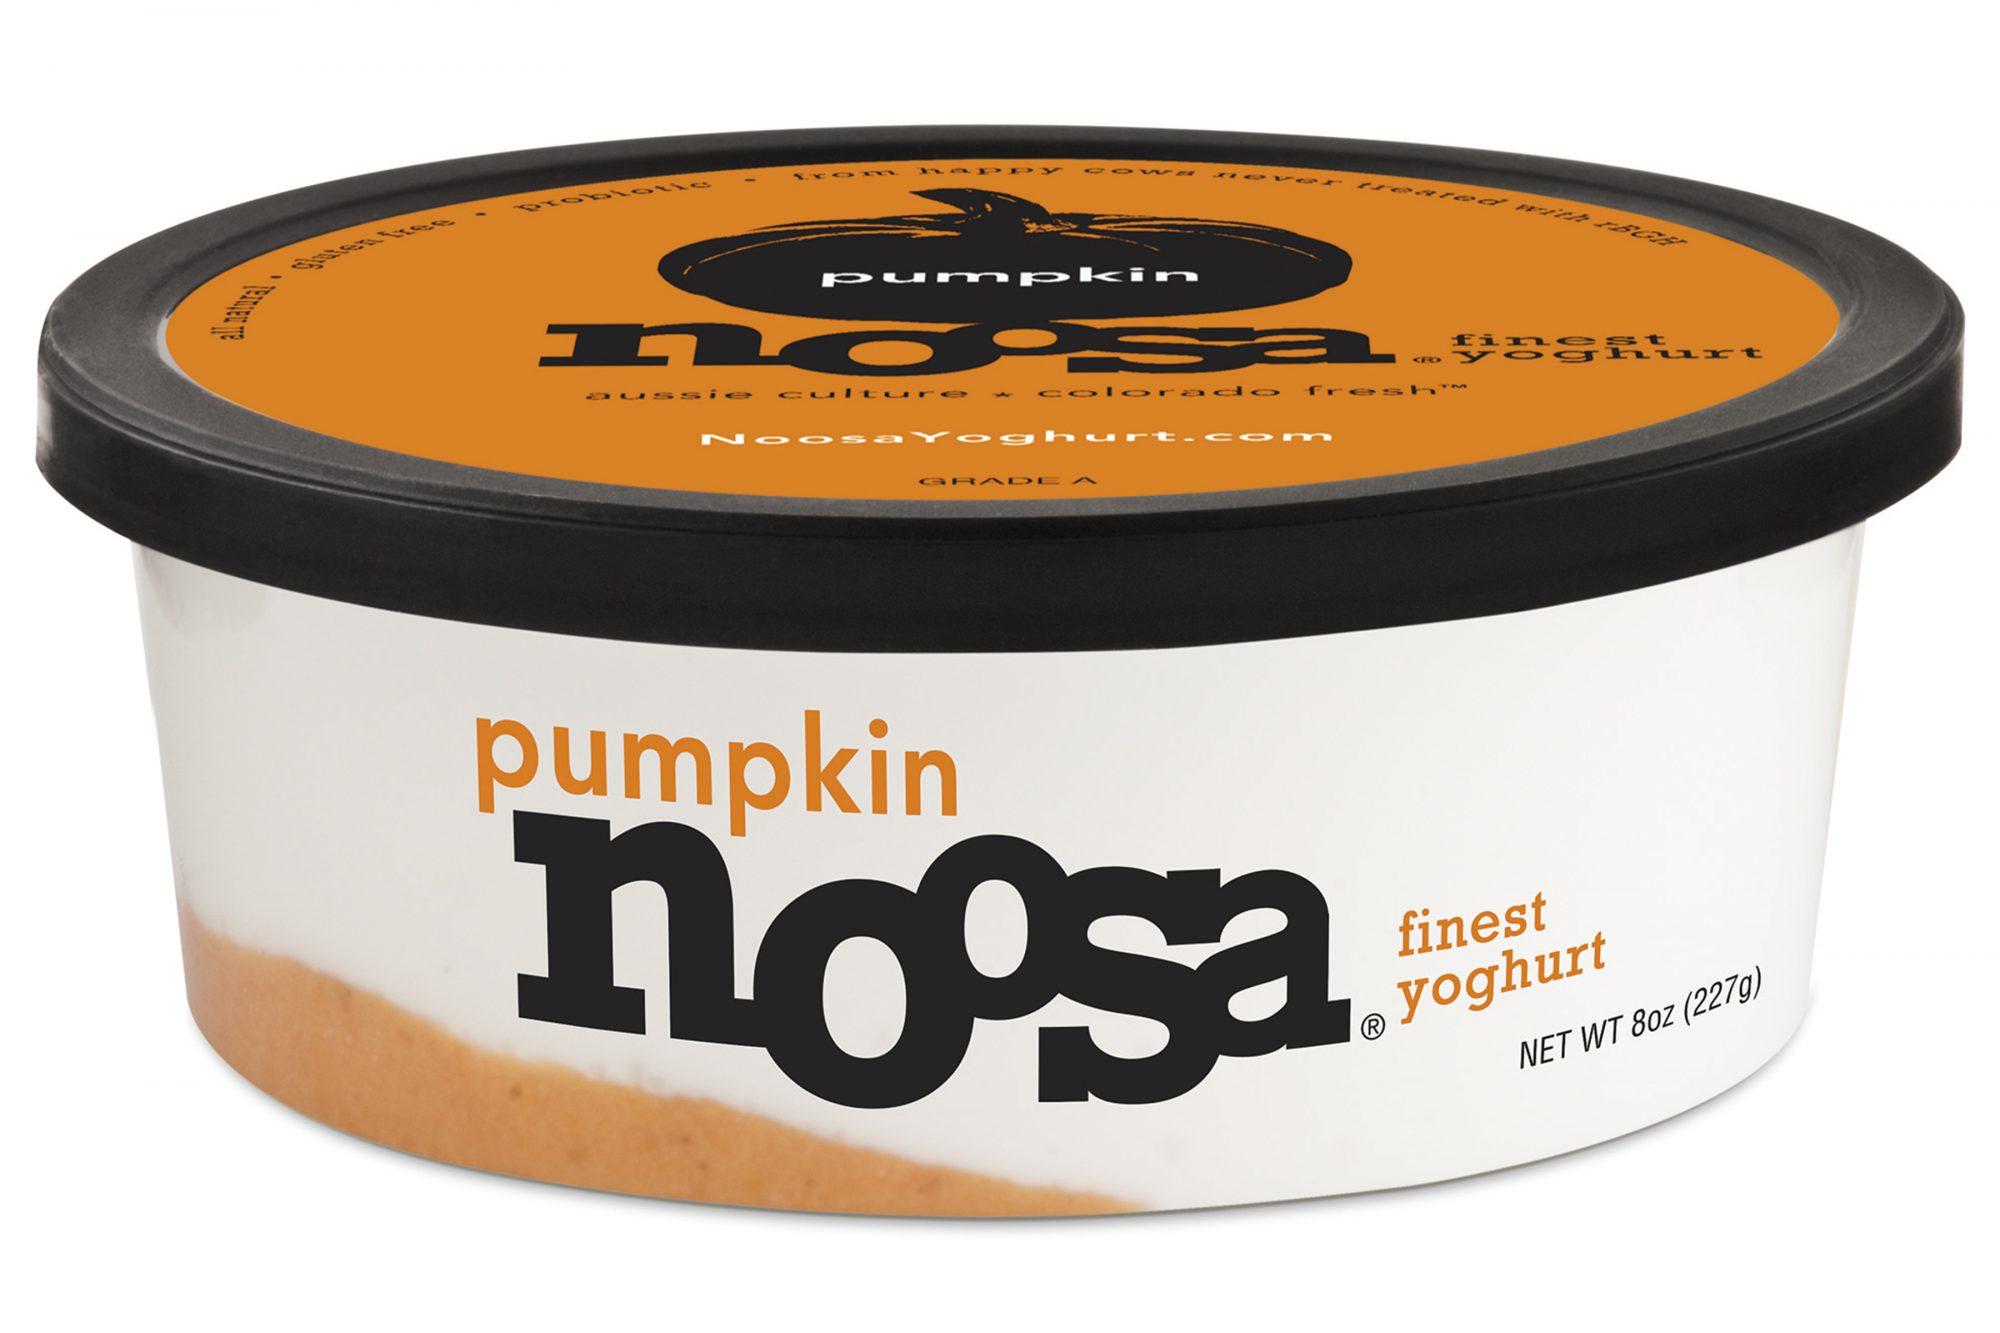 8oz-noosa-pumpkin-2.jpg